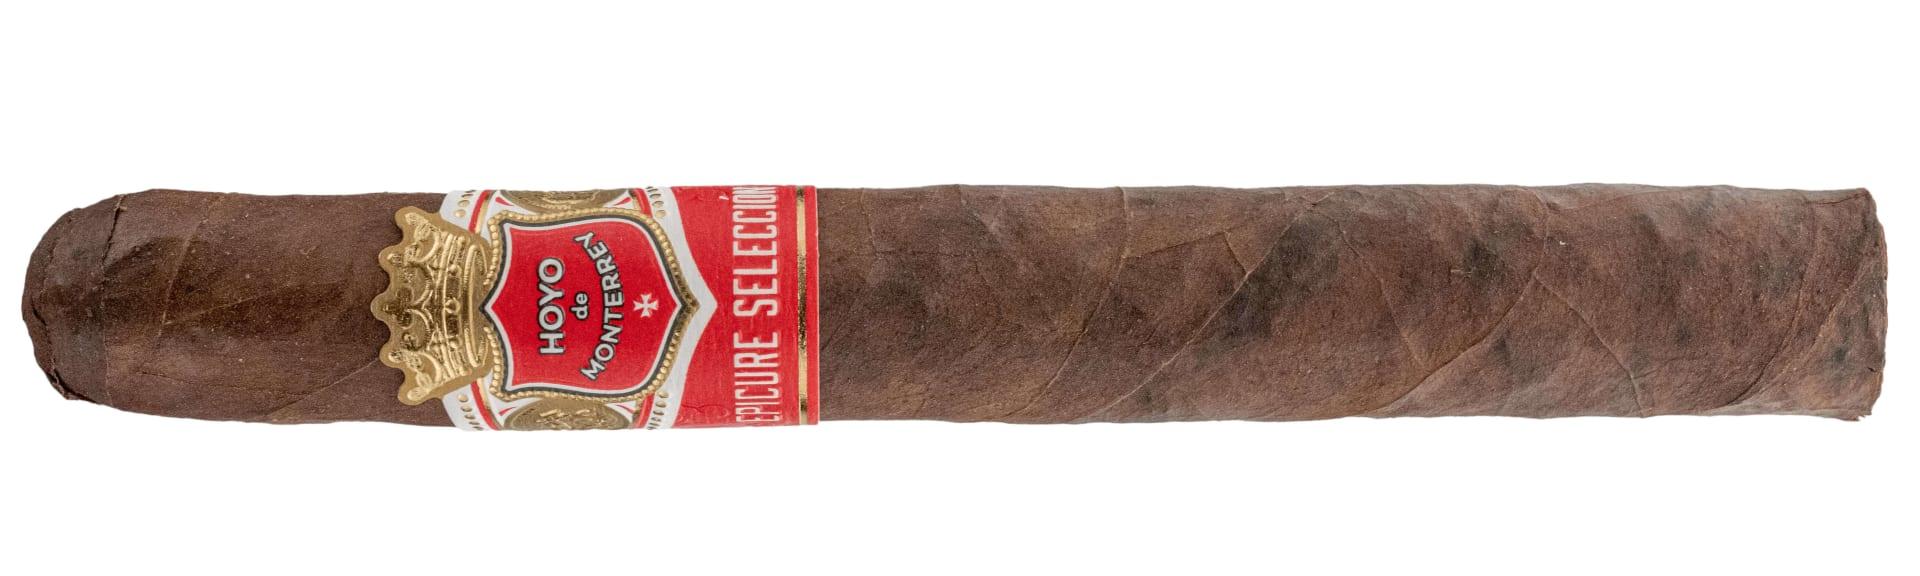 Blind Cigar Review: Hoyo de Monterrey | Epicure Selección No 1. Featured Image